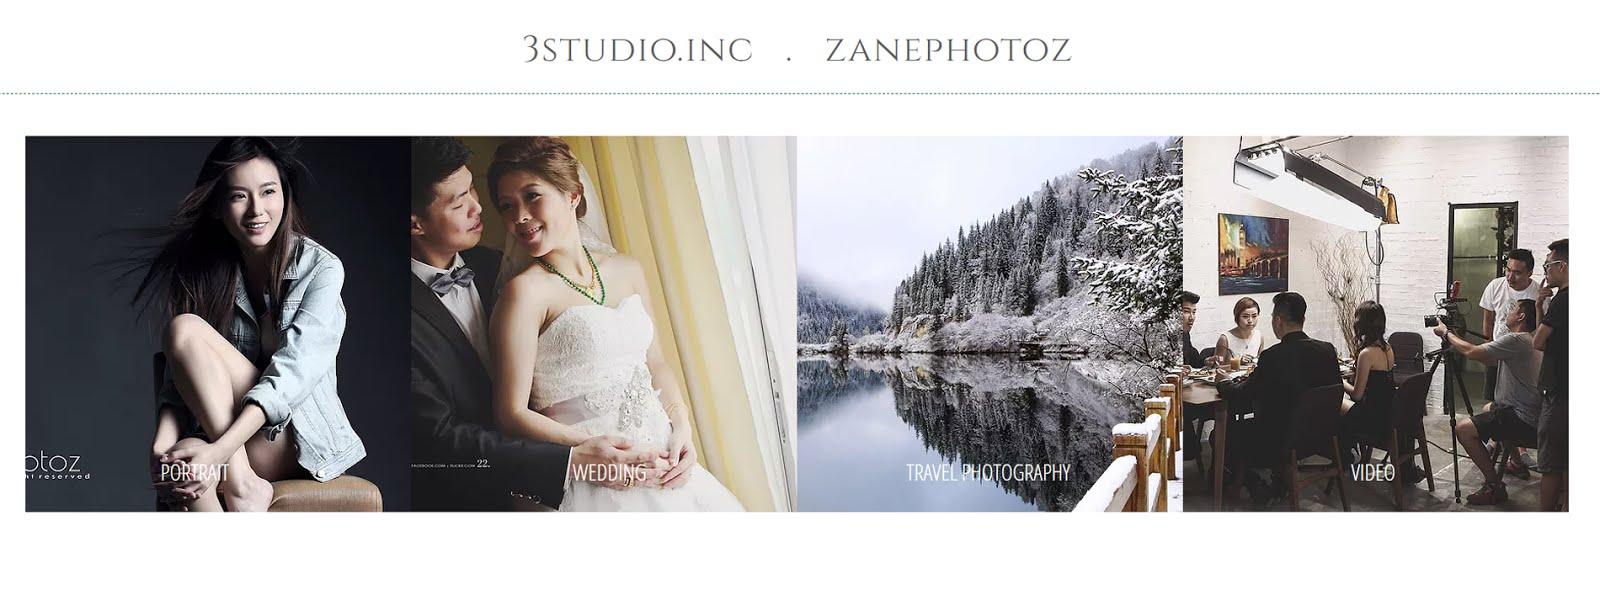 zanephoToz